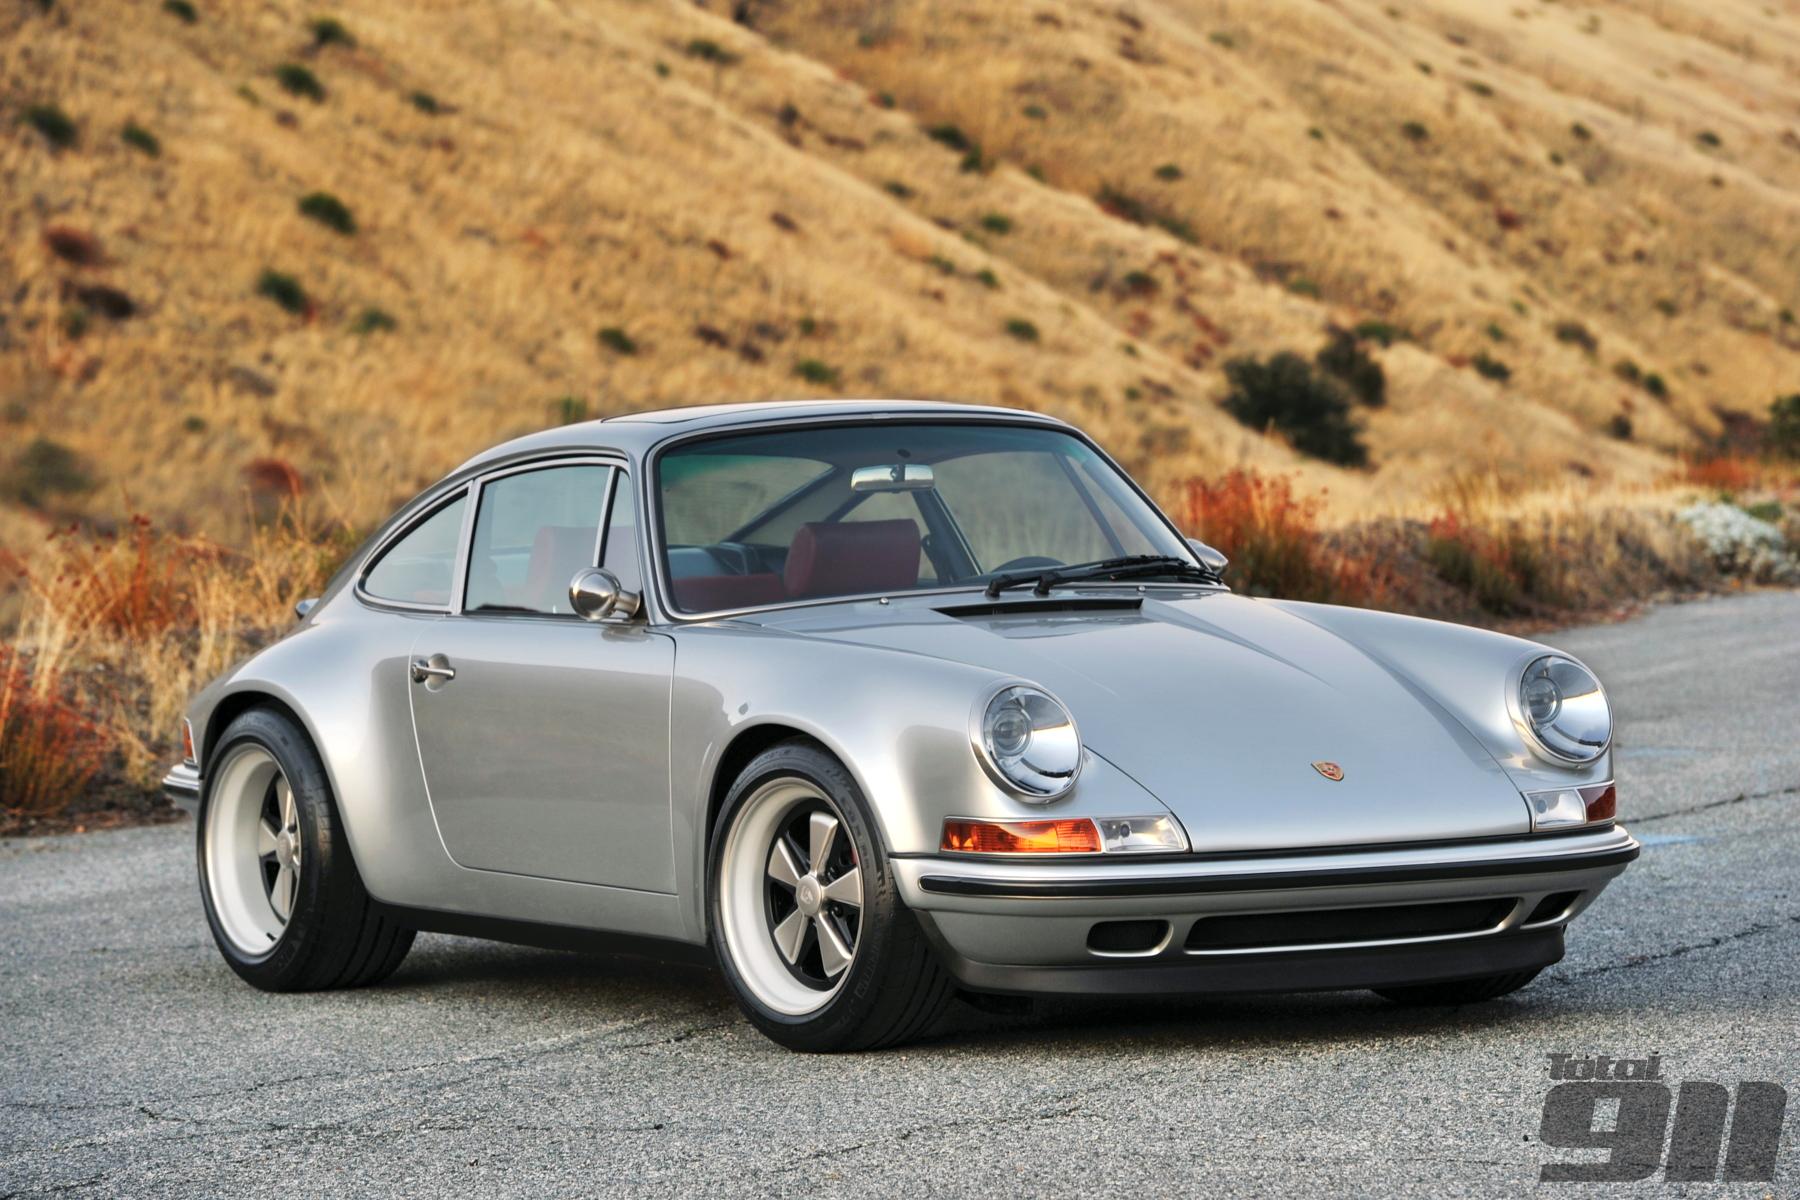 Fastest Car In The World Wallpaper 2015 Total 911 S Seven Favourite Modified Porsche 911s Total 911